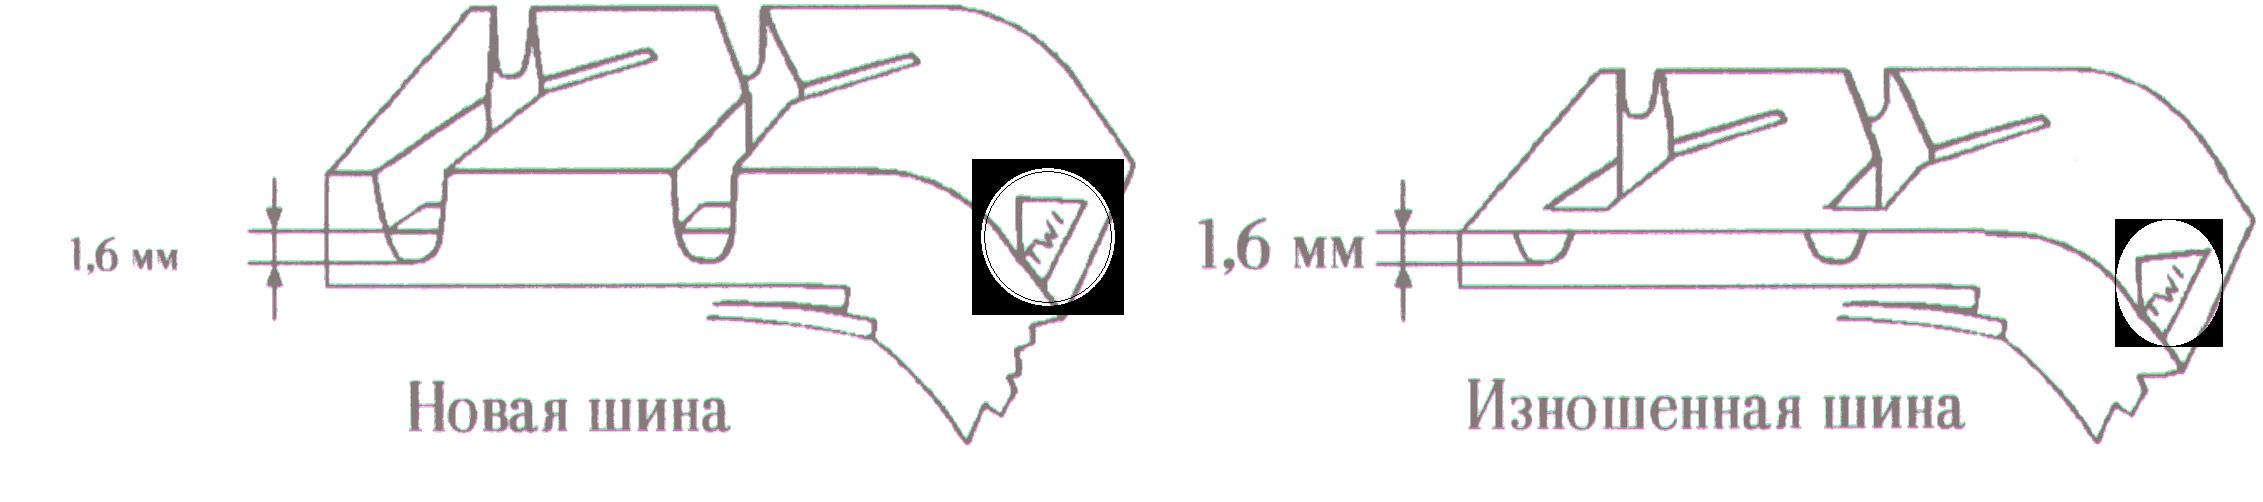 osobennosti-glubiny-protektora-shin-bridgestone10